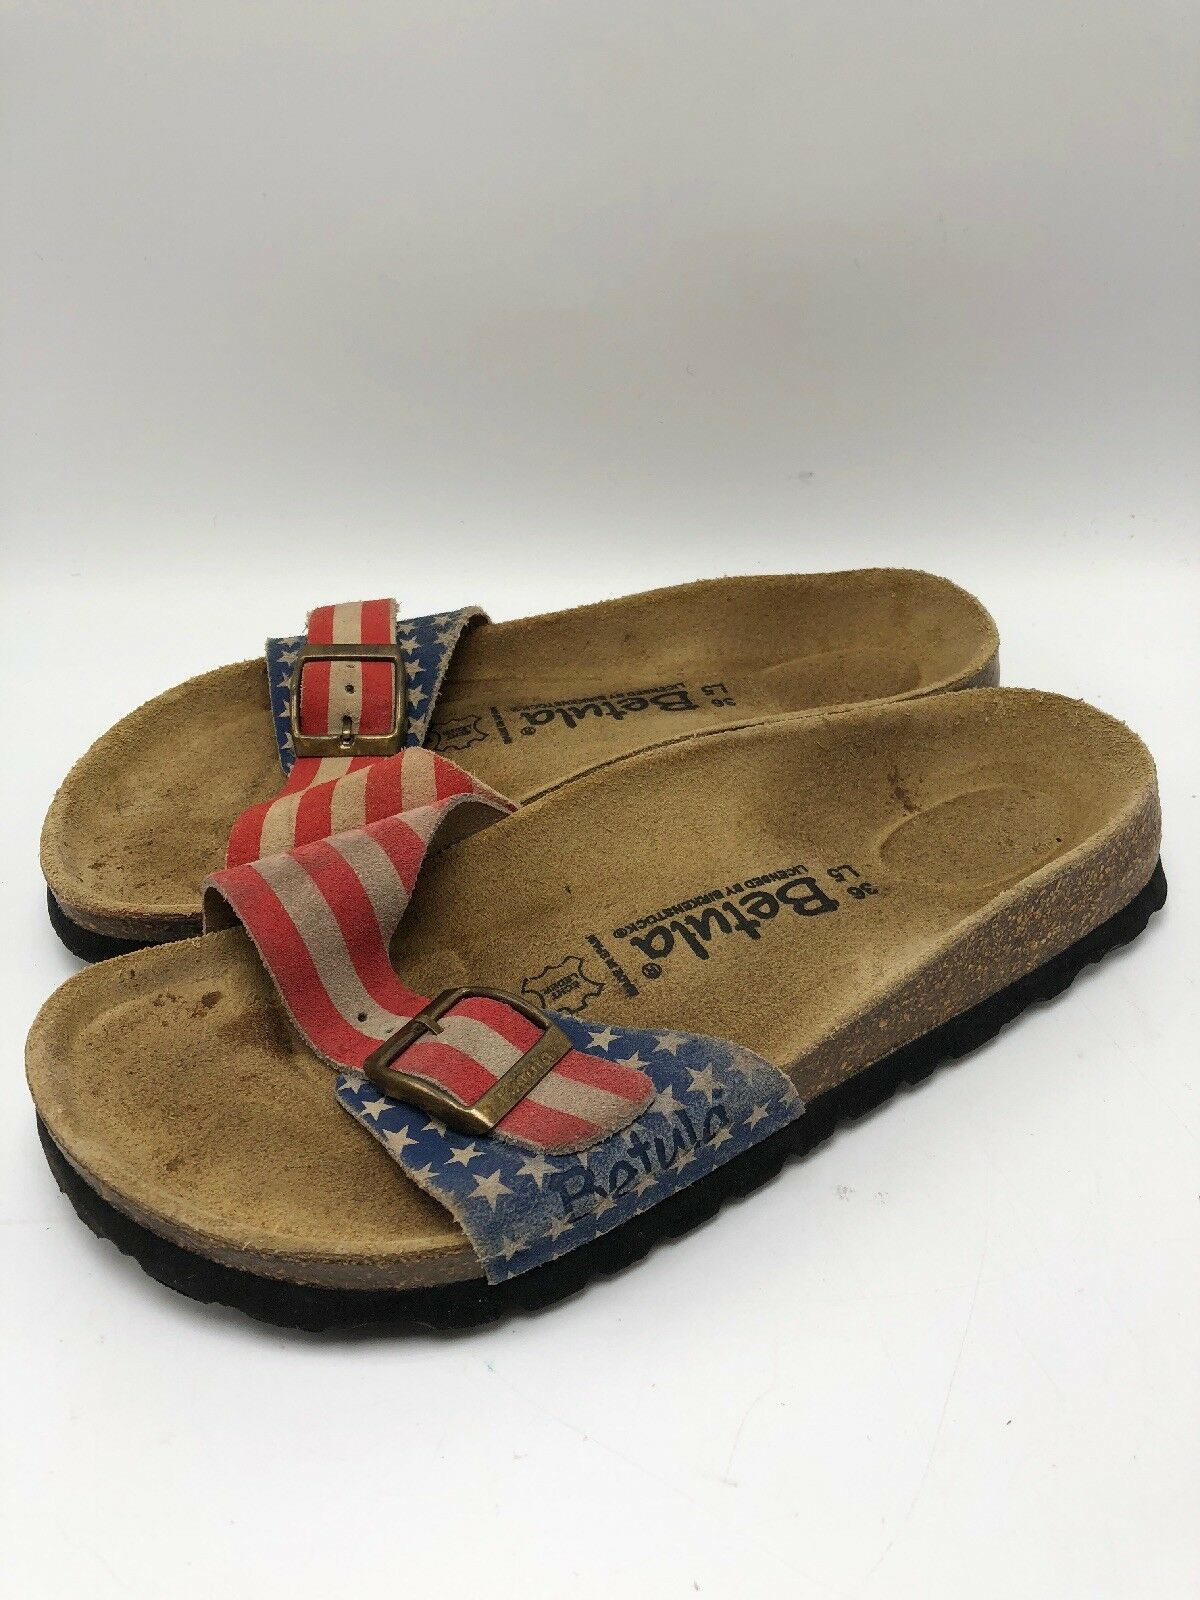 Betula by BIRKESSTOCK 36 RARE American Flag Single Strap  SANDALS SUEDE - USA 4th  fabbrica diretta